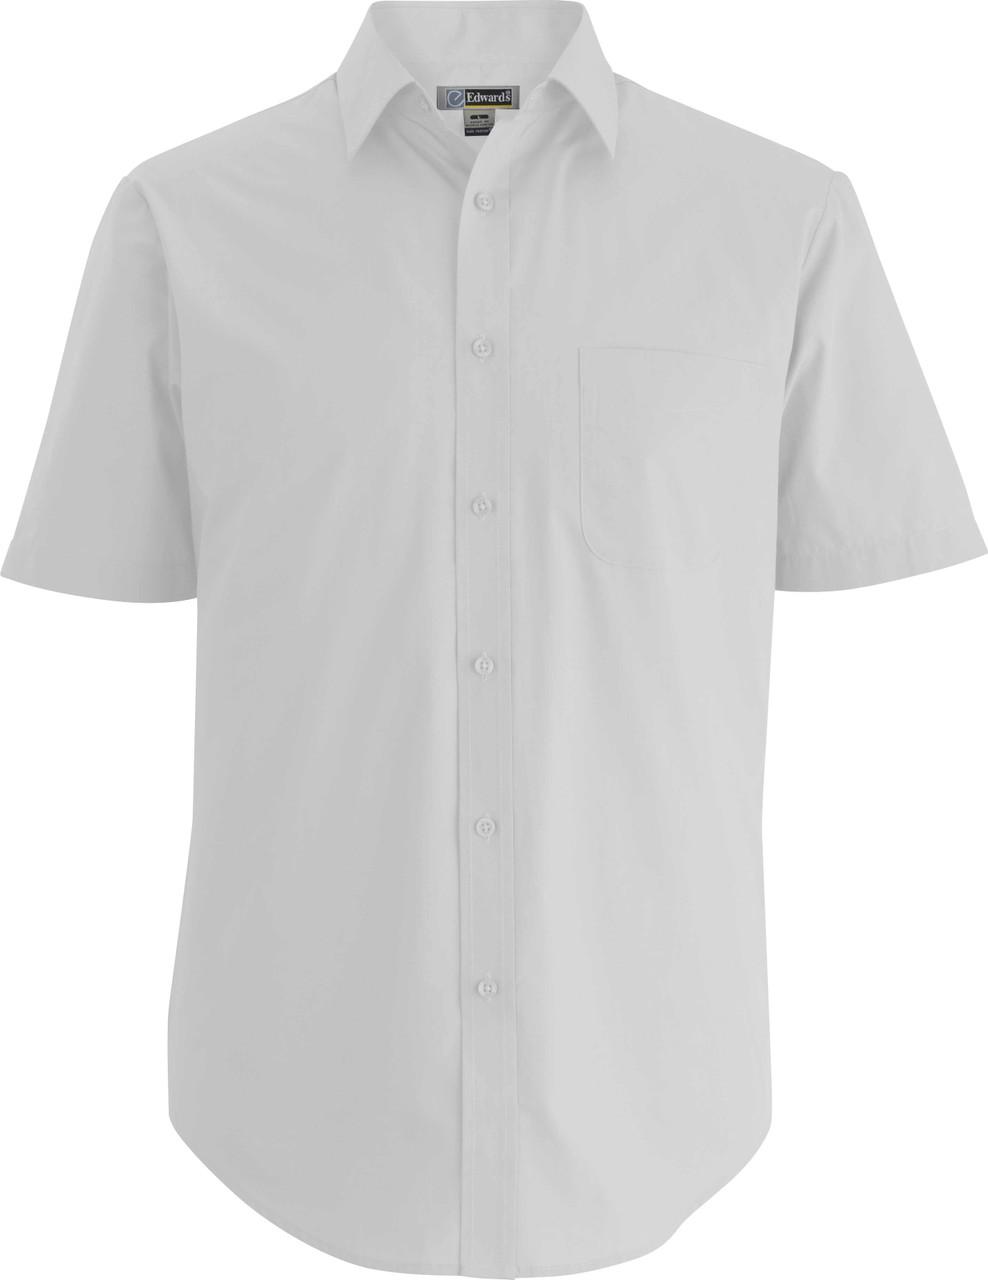 Men's Short Sleeve Essential Uniform Shirt